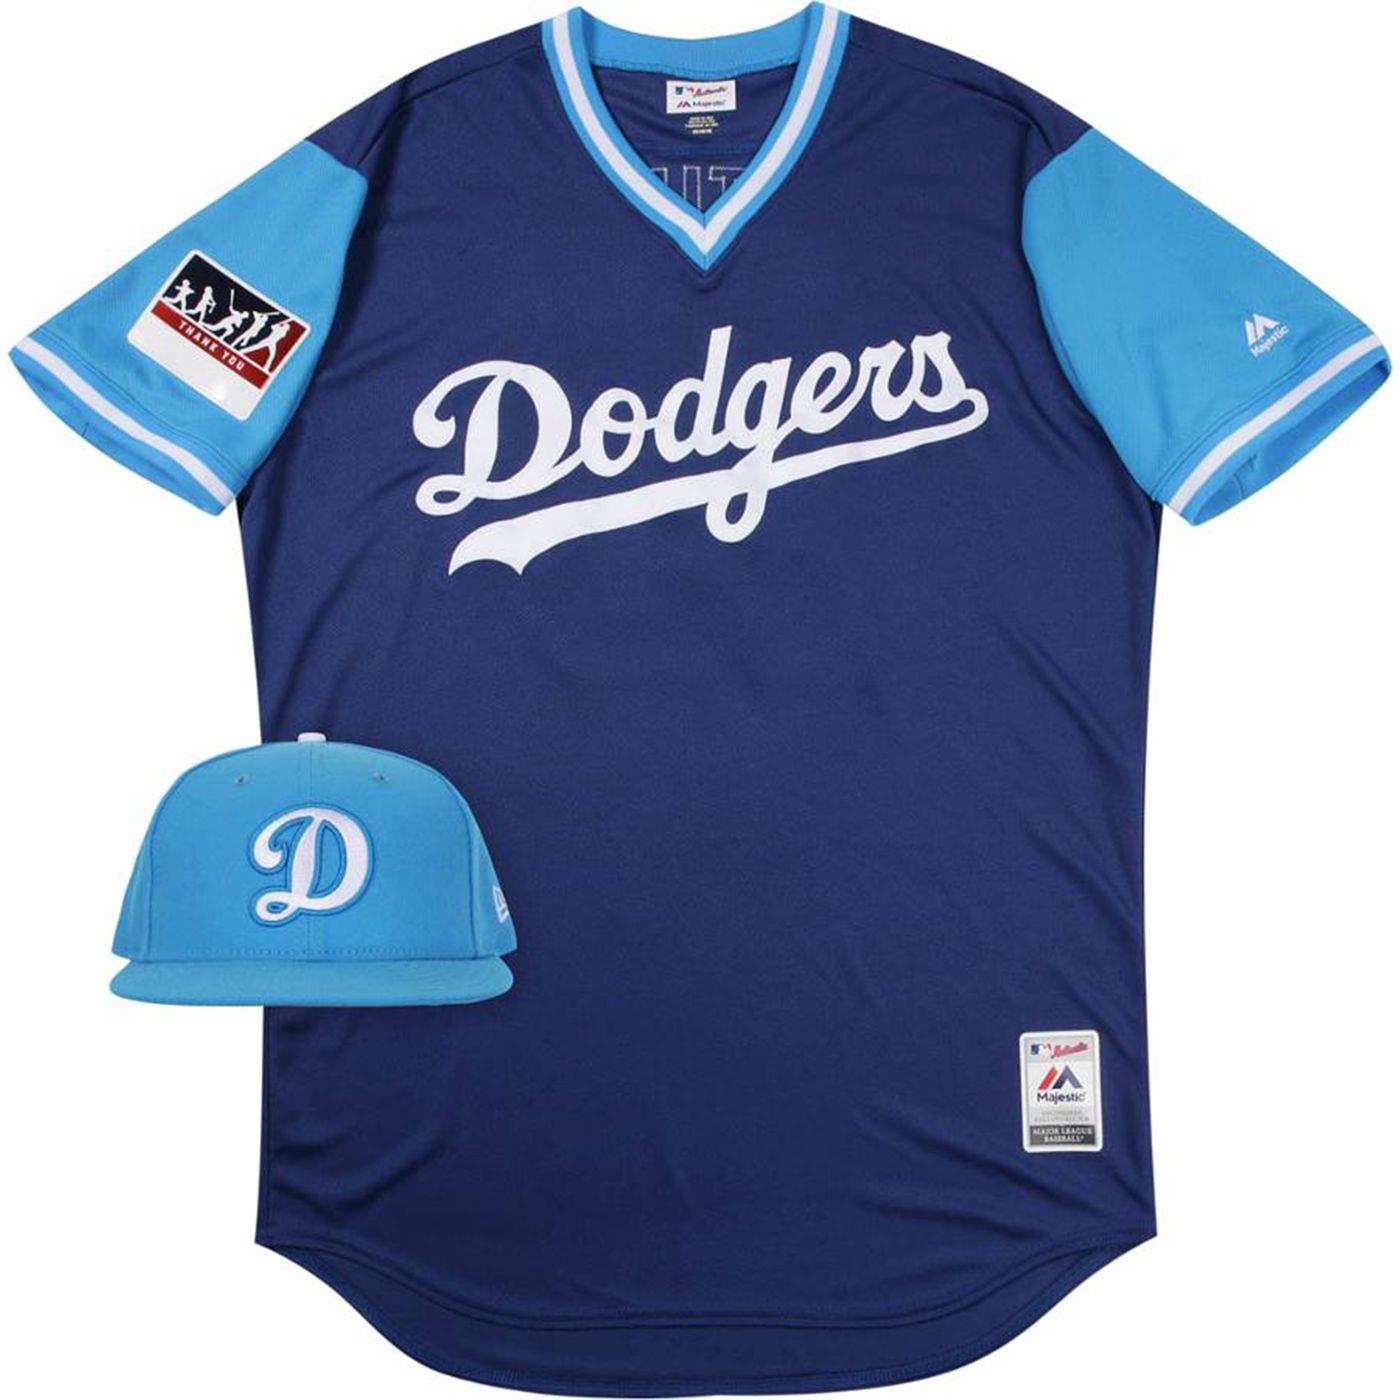 Dodgers unveil Players Weekend uniforms - True Blue LA 7adda2b3107